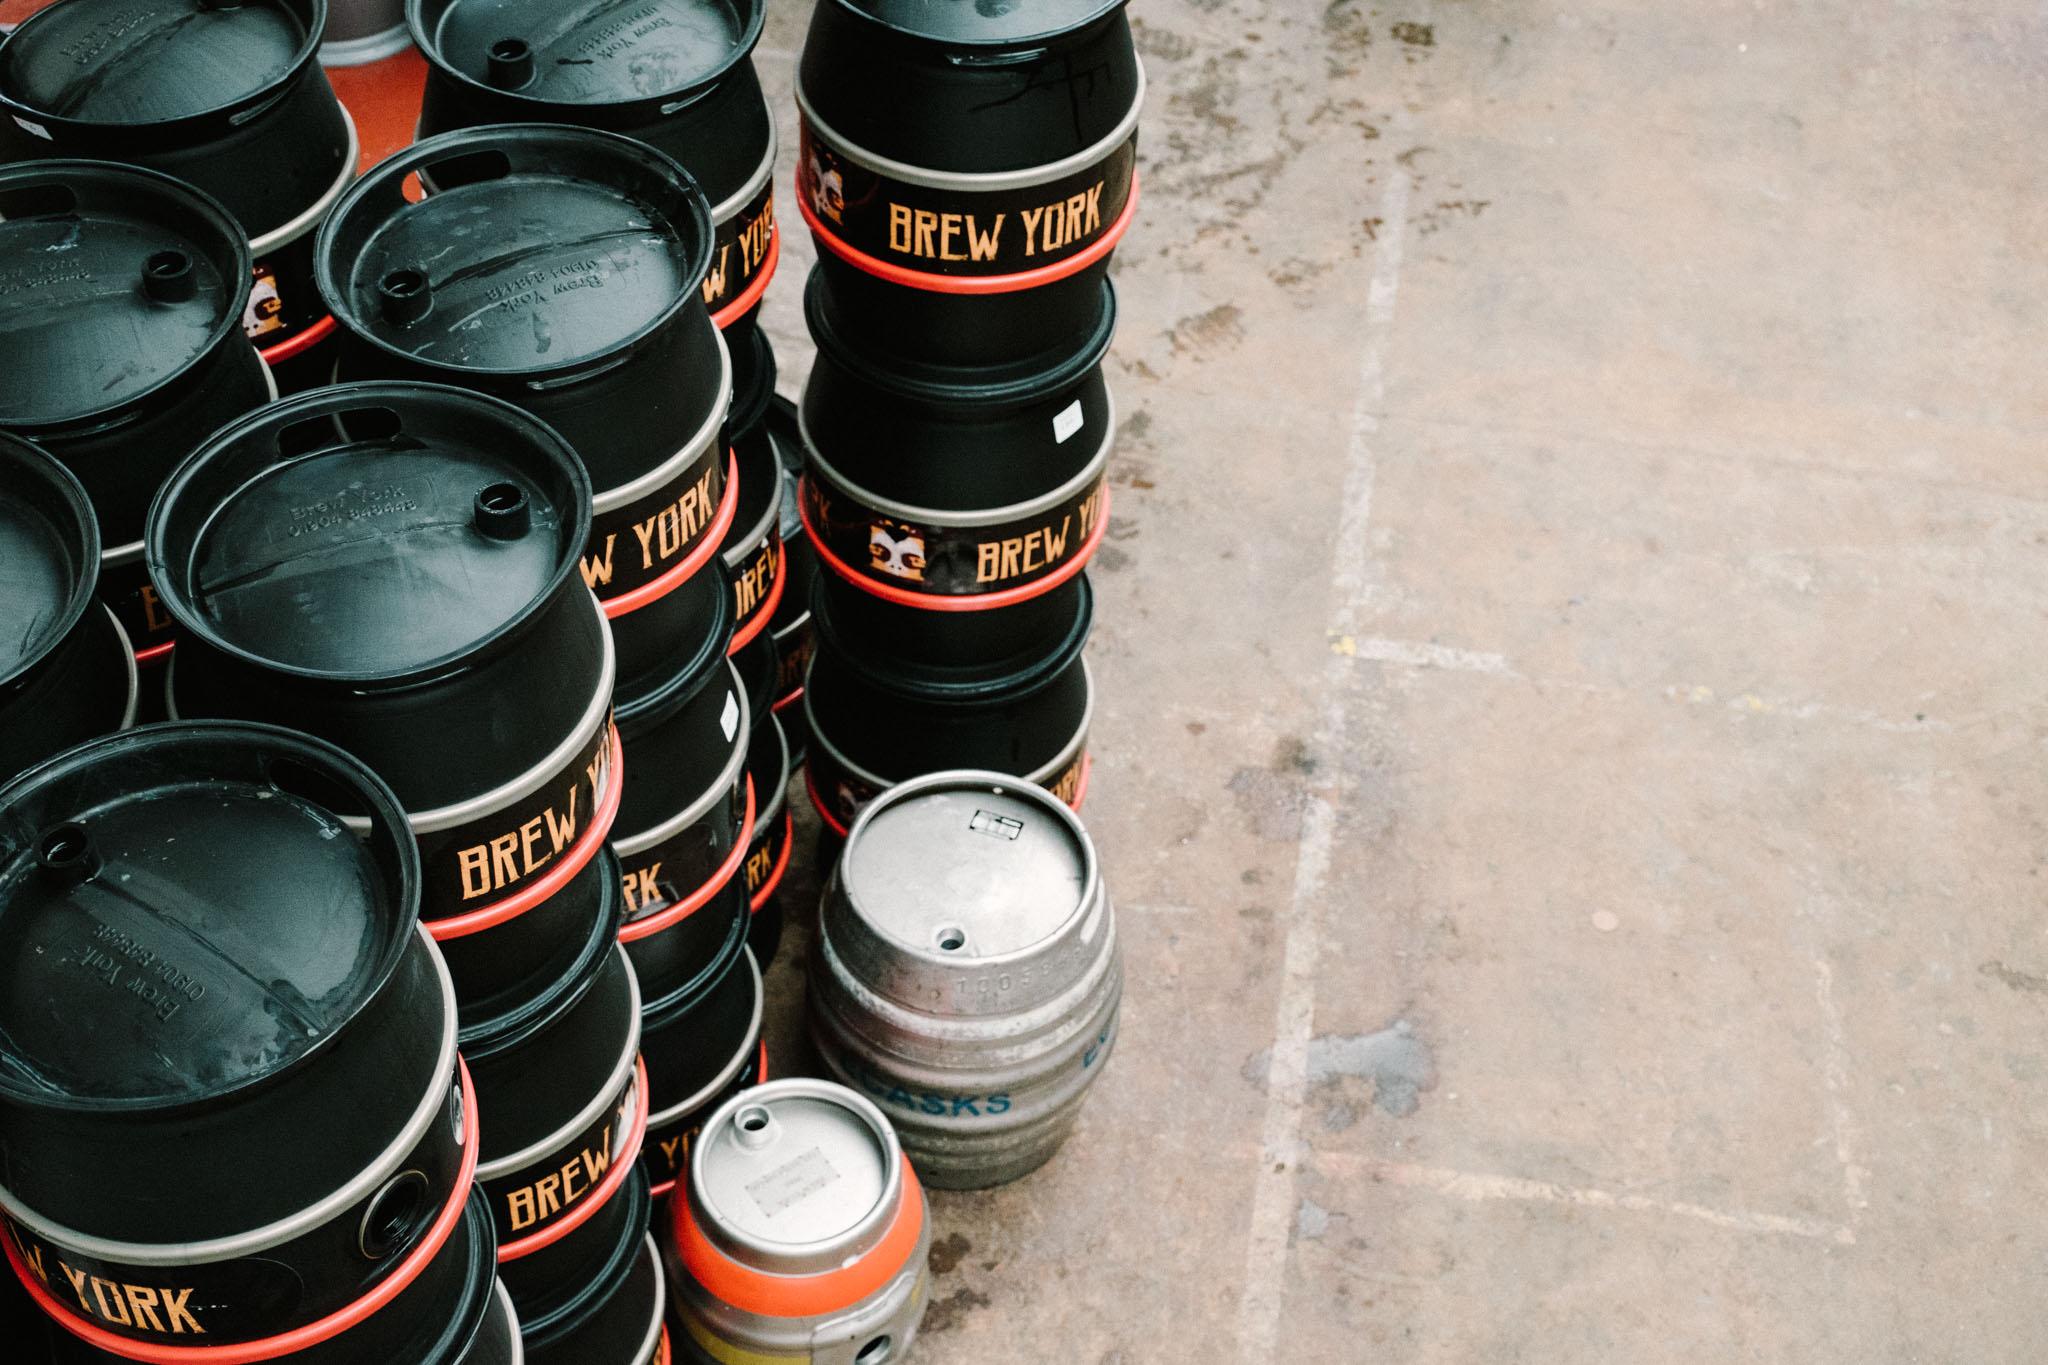 brew-york-160720-141448.jpg